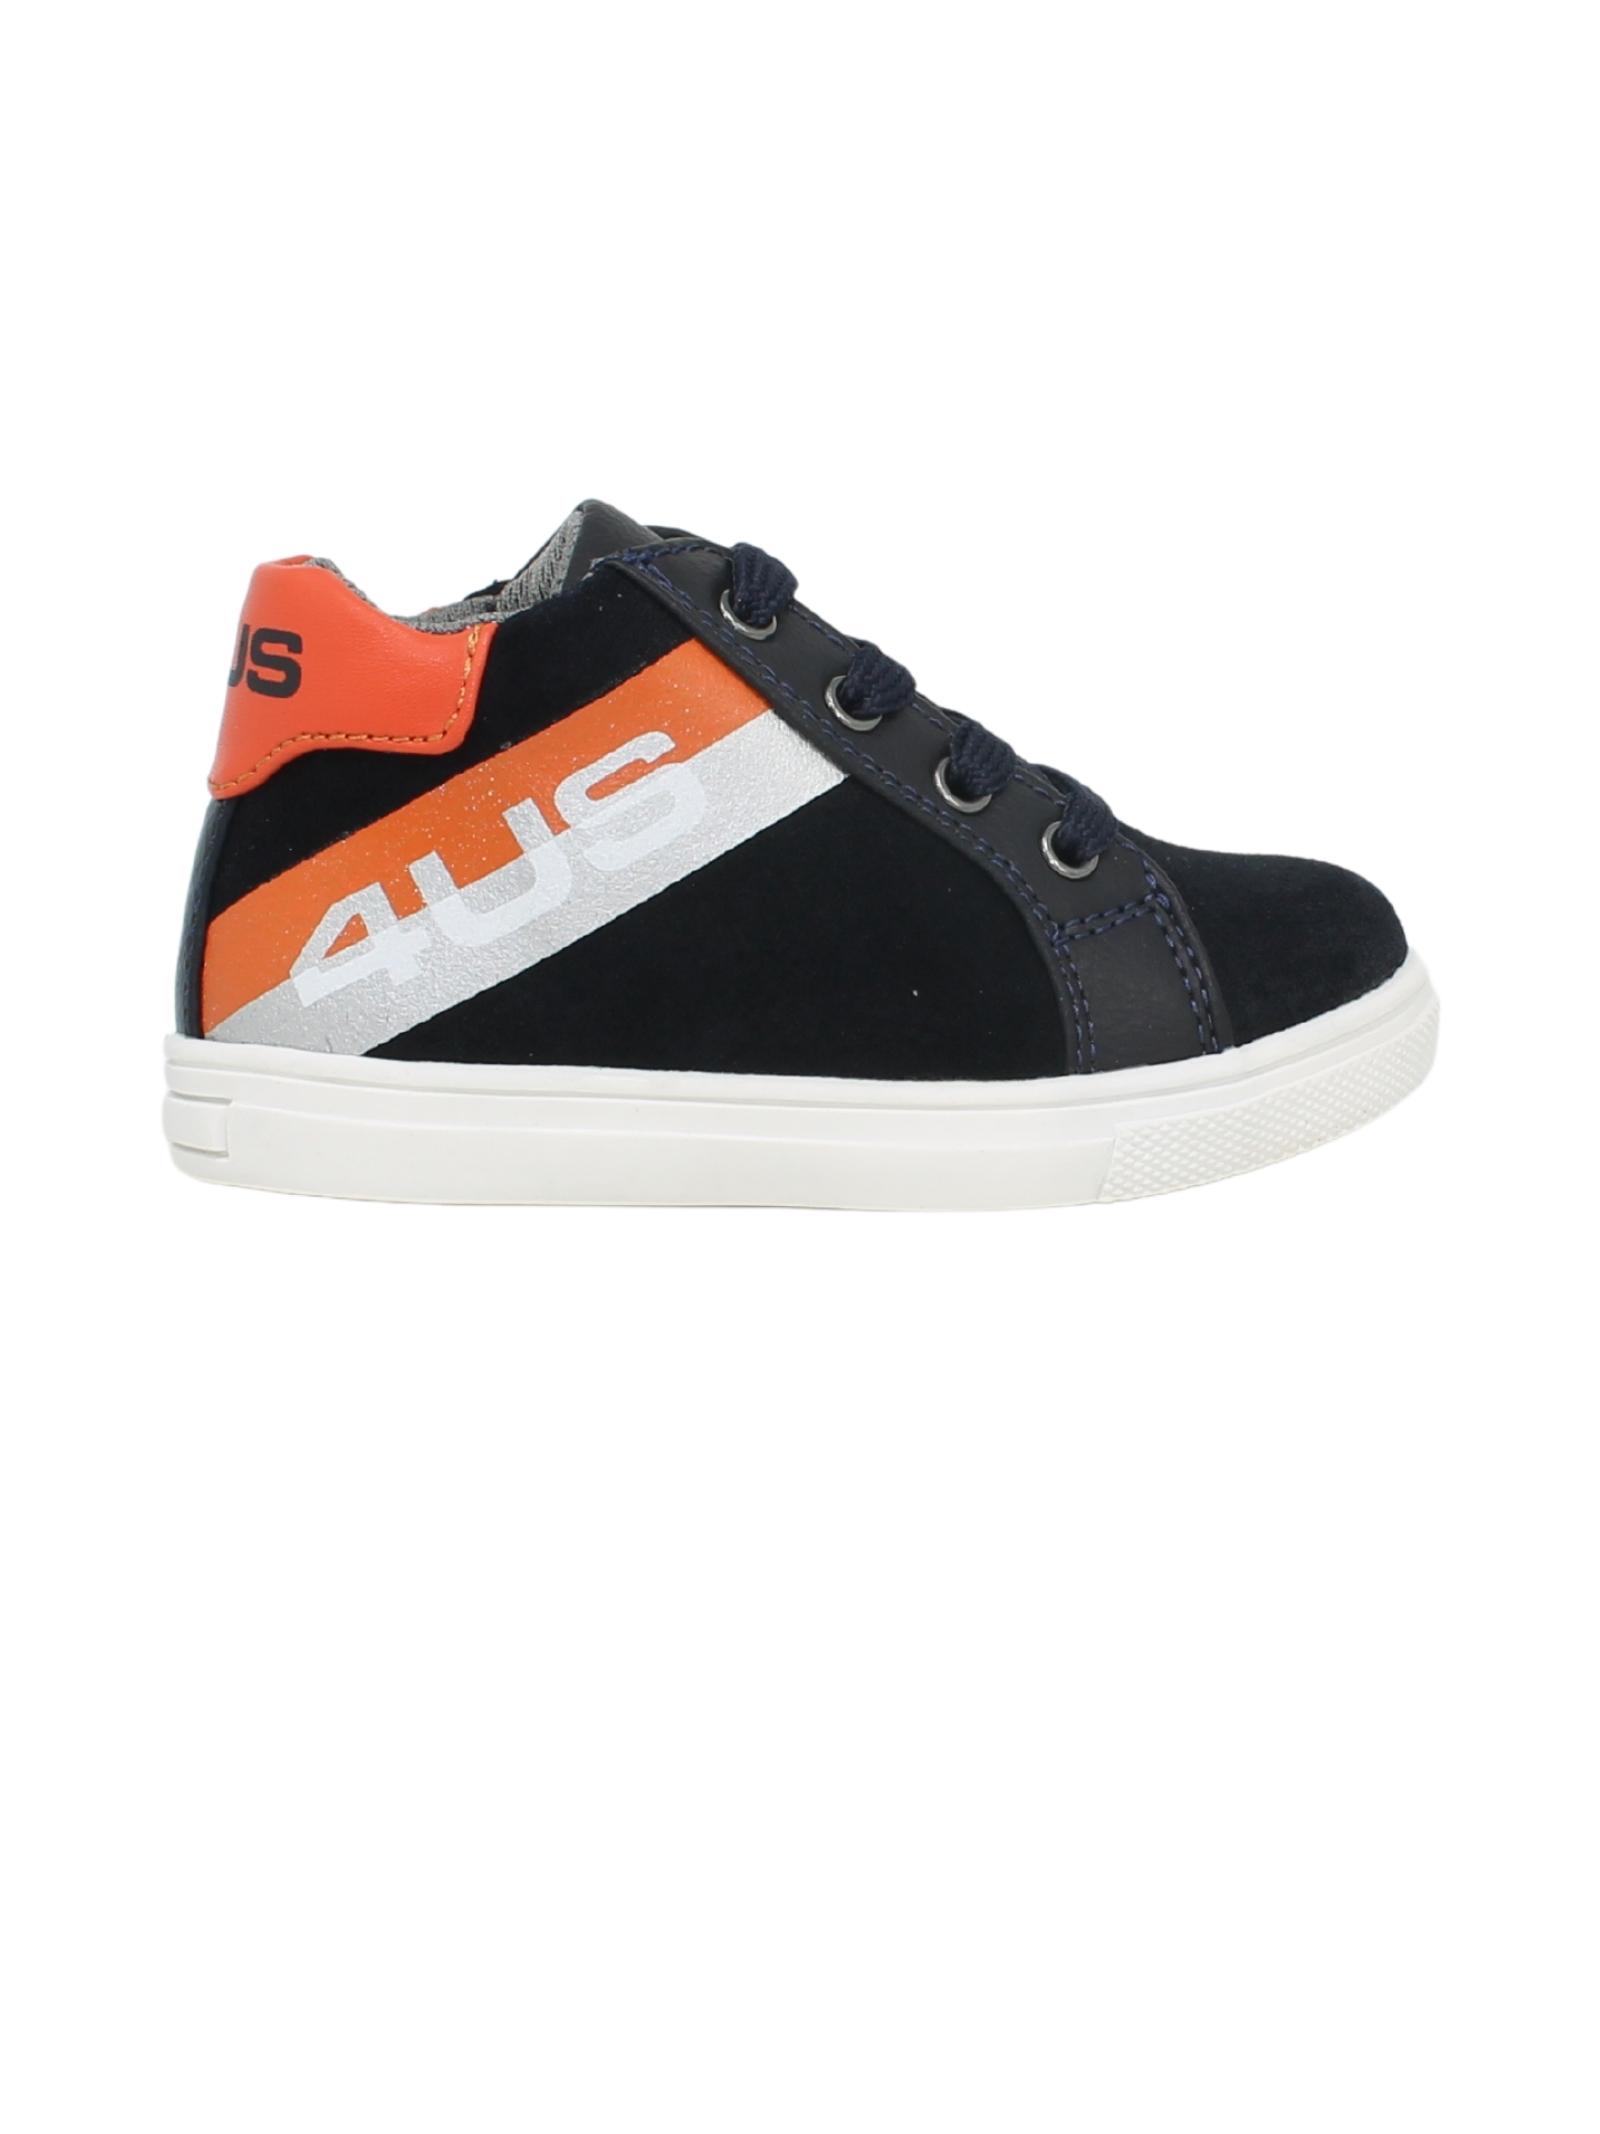 Blue and Orange Baby Sneakers CESARE PACIOTTI | Sneakers | 4U141BLU